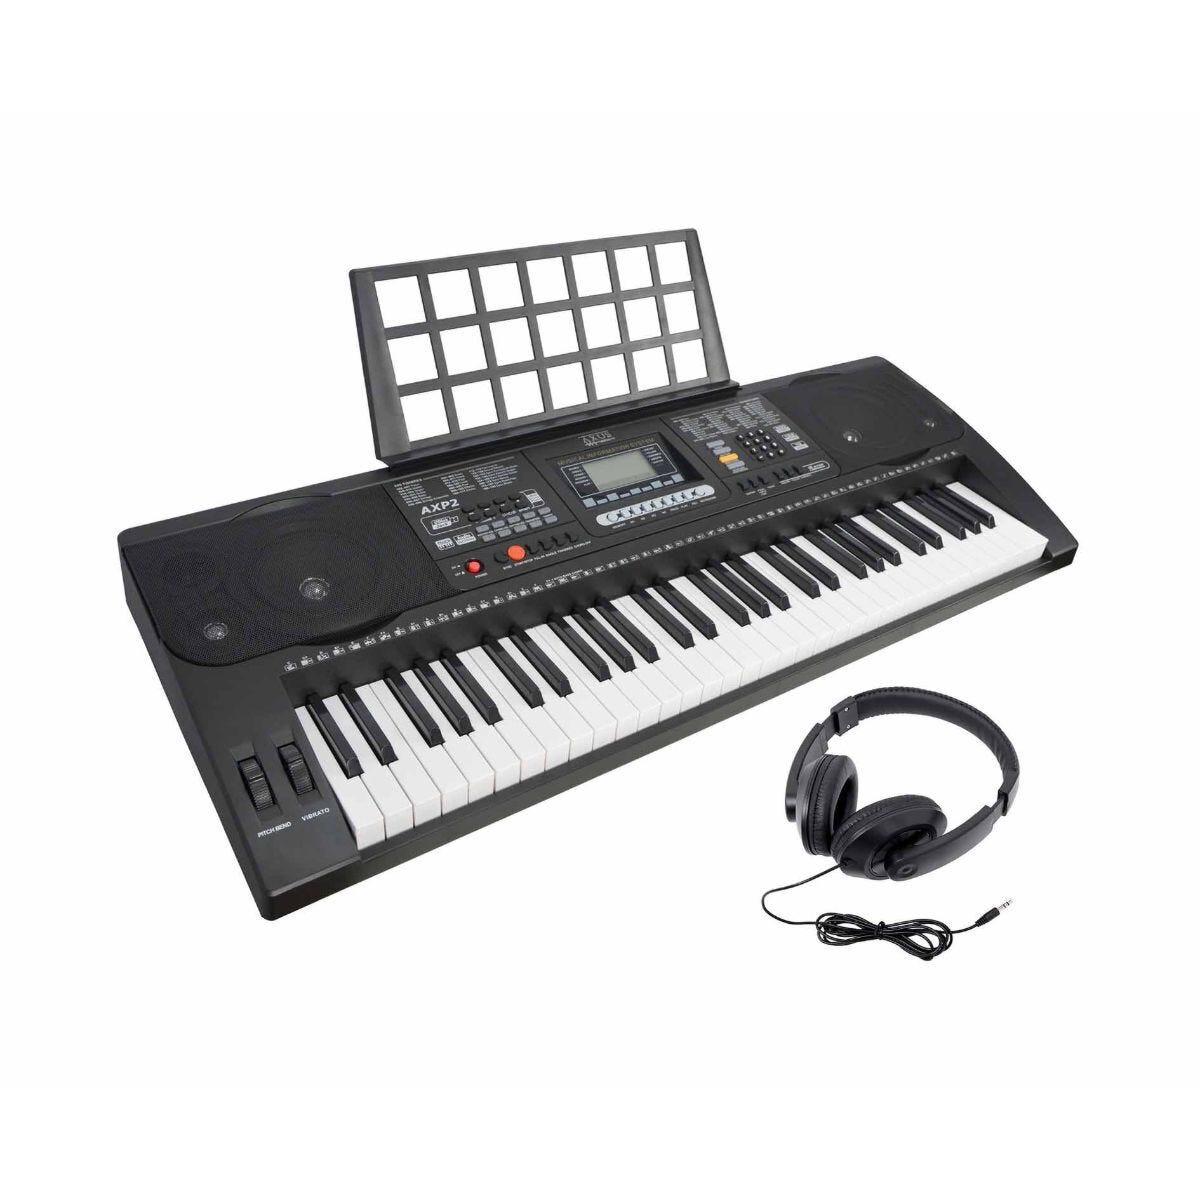 Axus Digital AXP2 Touch Sensitive Keyboard